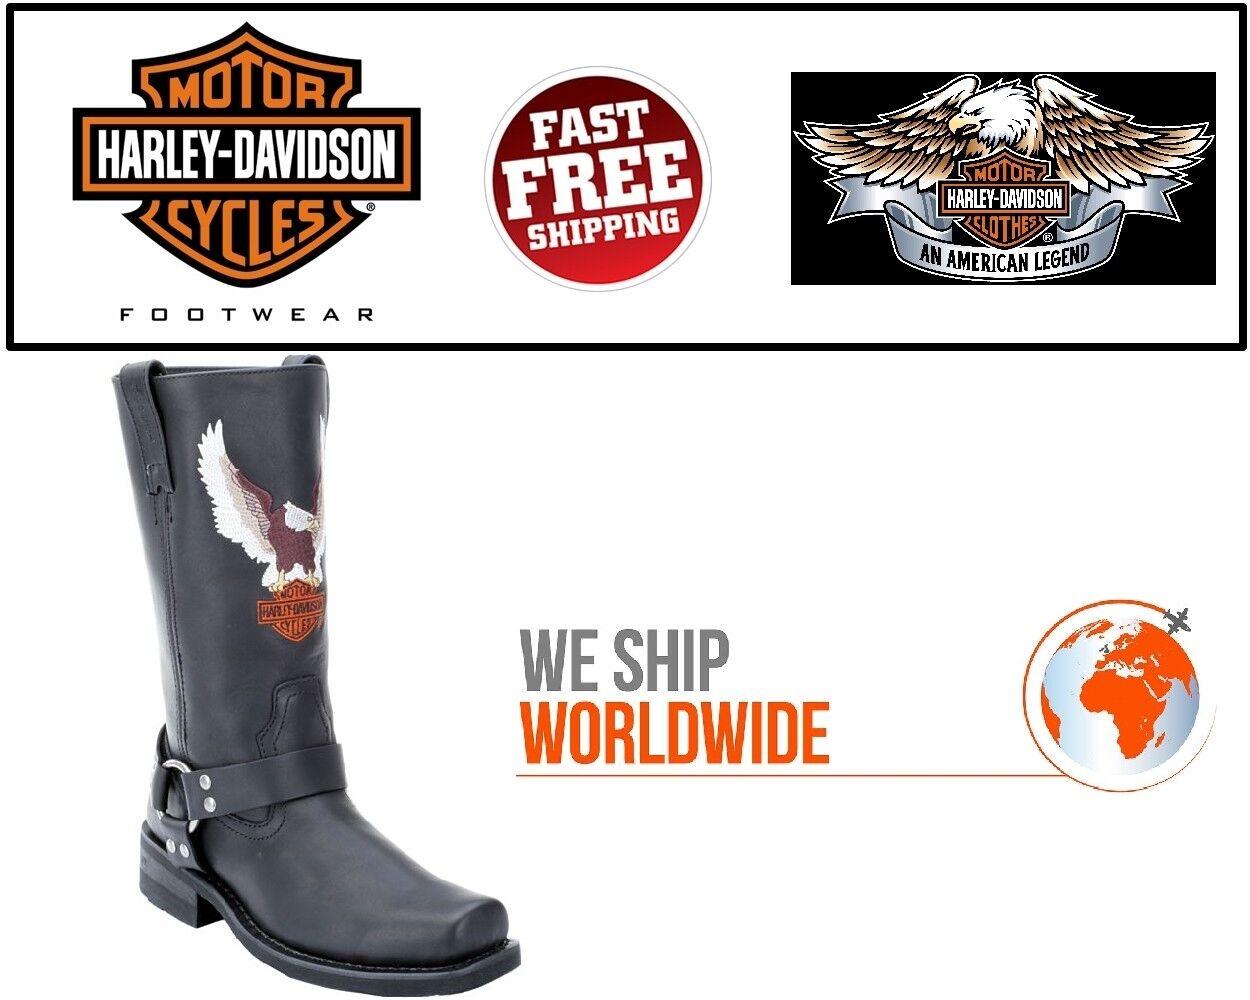 Harley-Davidson D93216 Hombre Darren Cuero Negro Equitación Mc botas-Usa Company